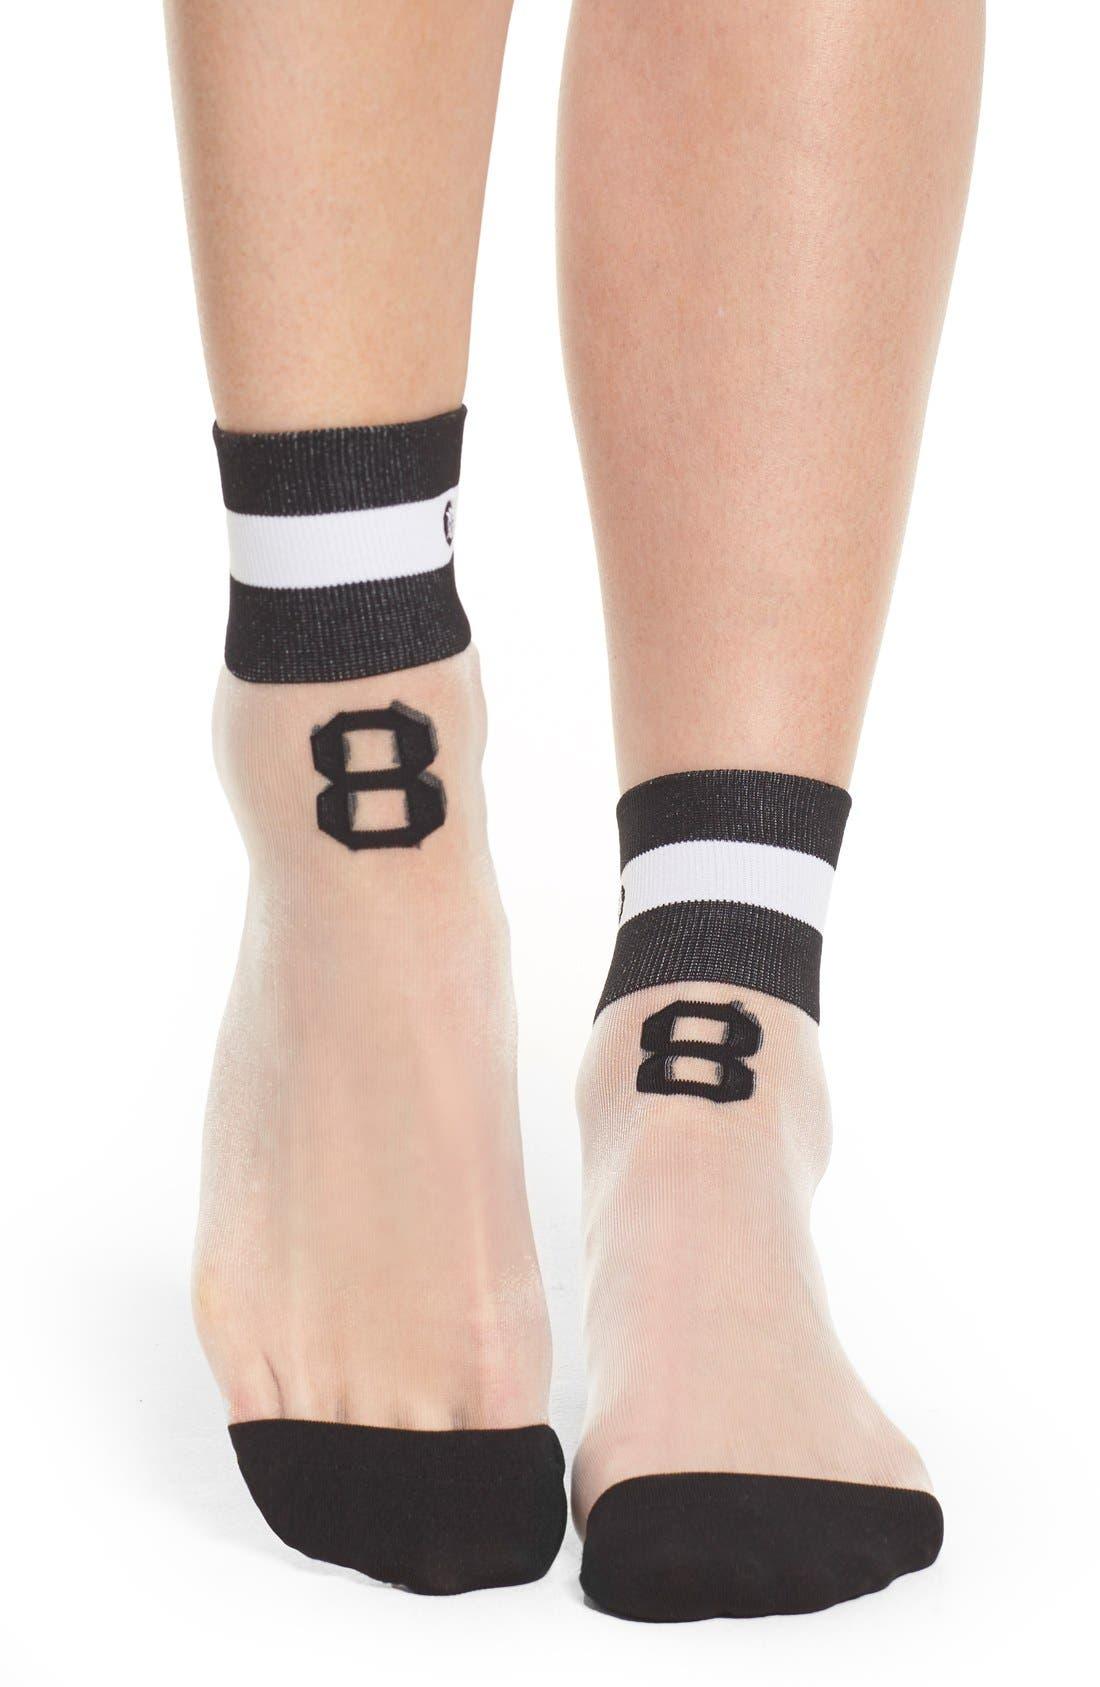 Main Image - Stance x Rihanna '88' Anklet Socks